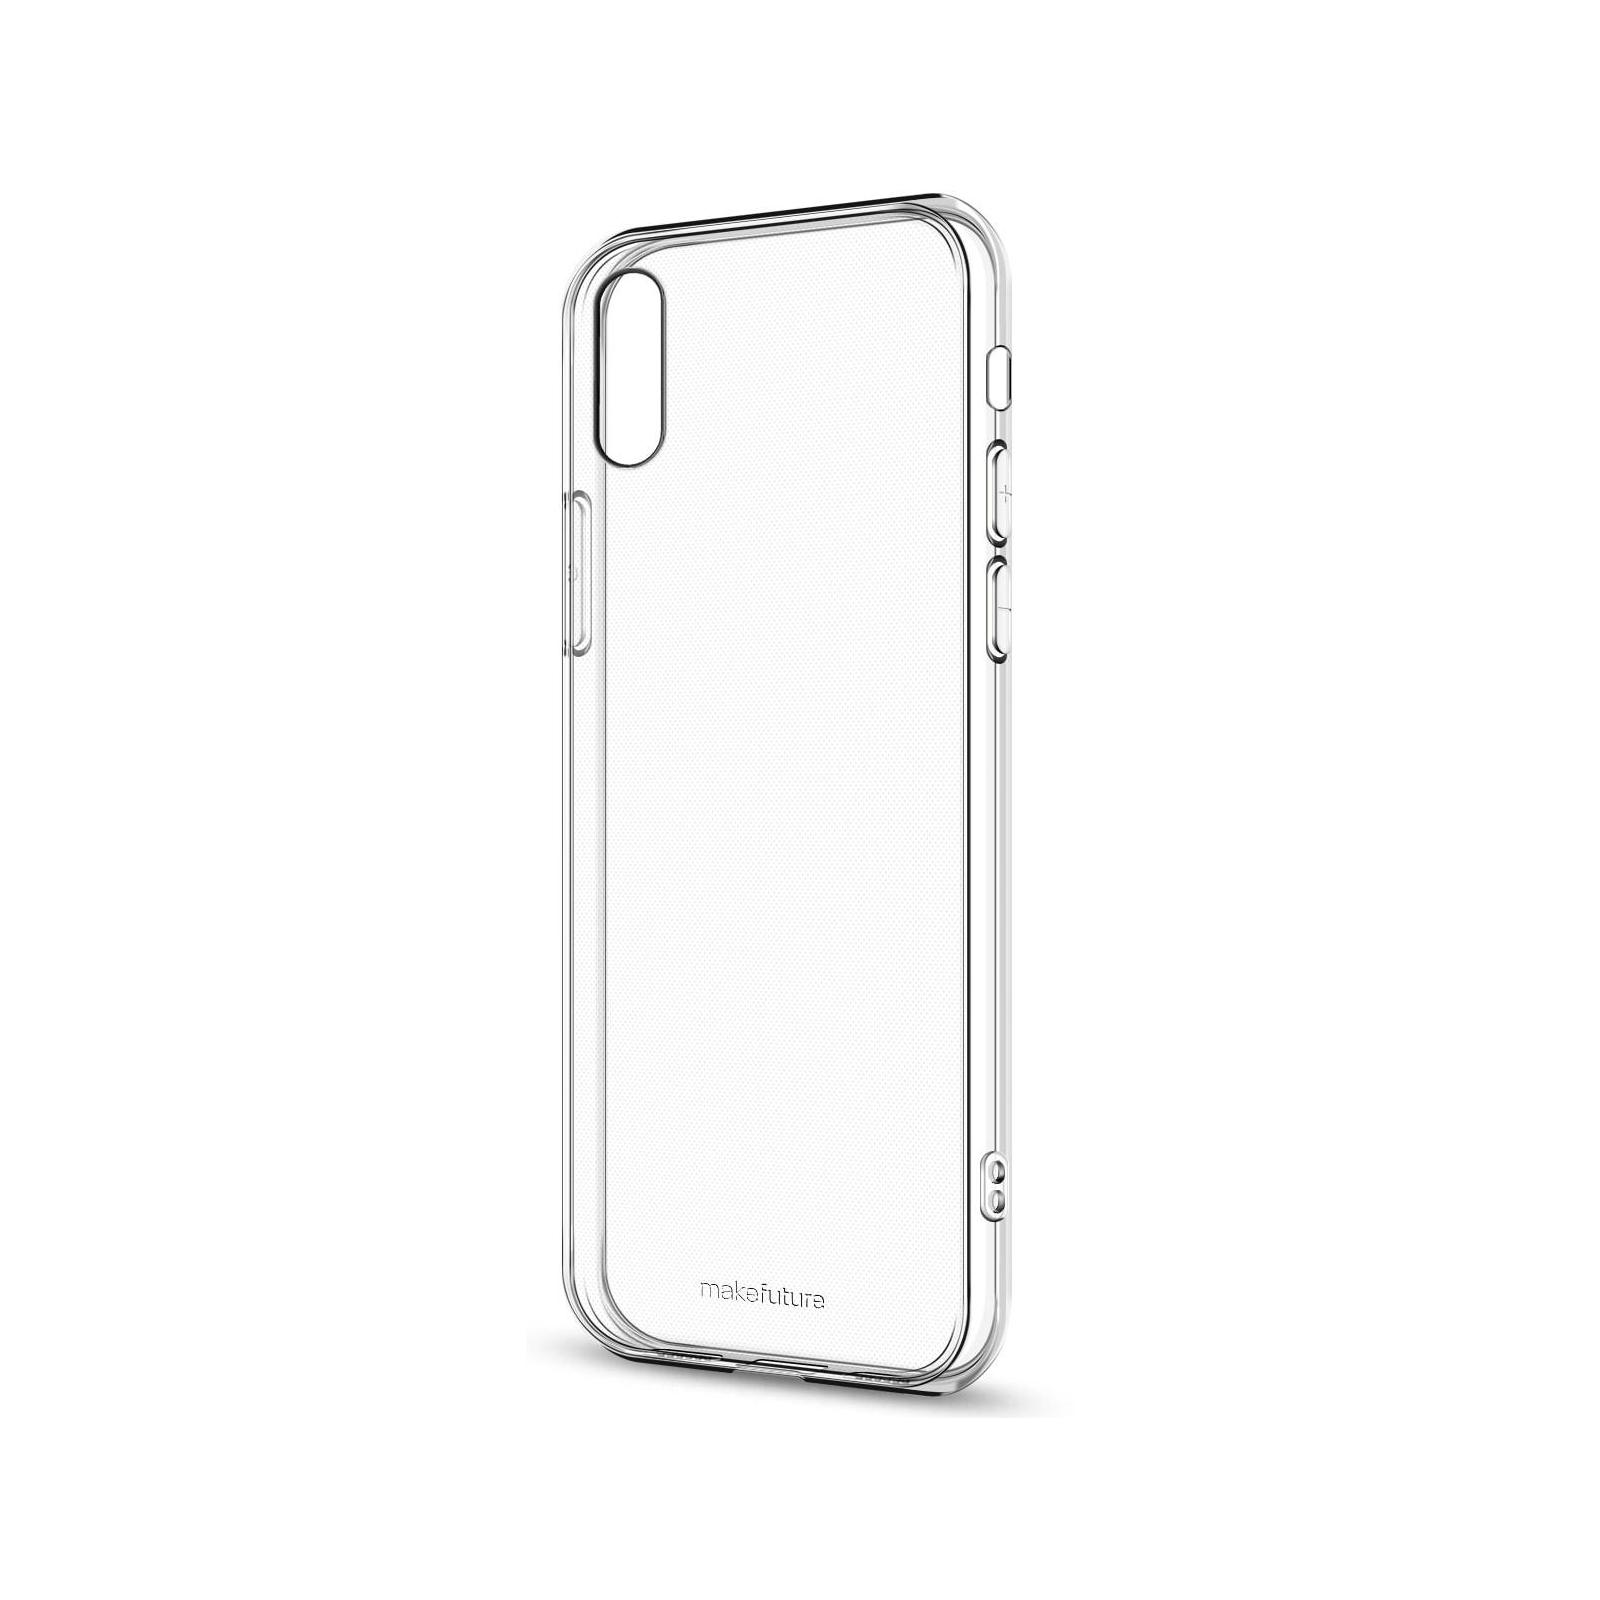 Чехол для моб. телефона MakeFuture Air Case (TPU) Apple iPhone XS Clear (MCA-AIXSCL)